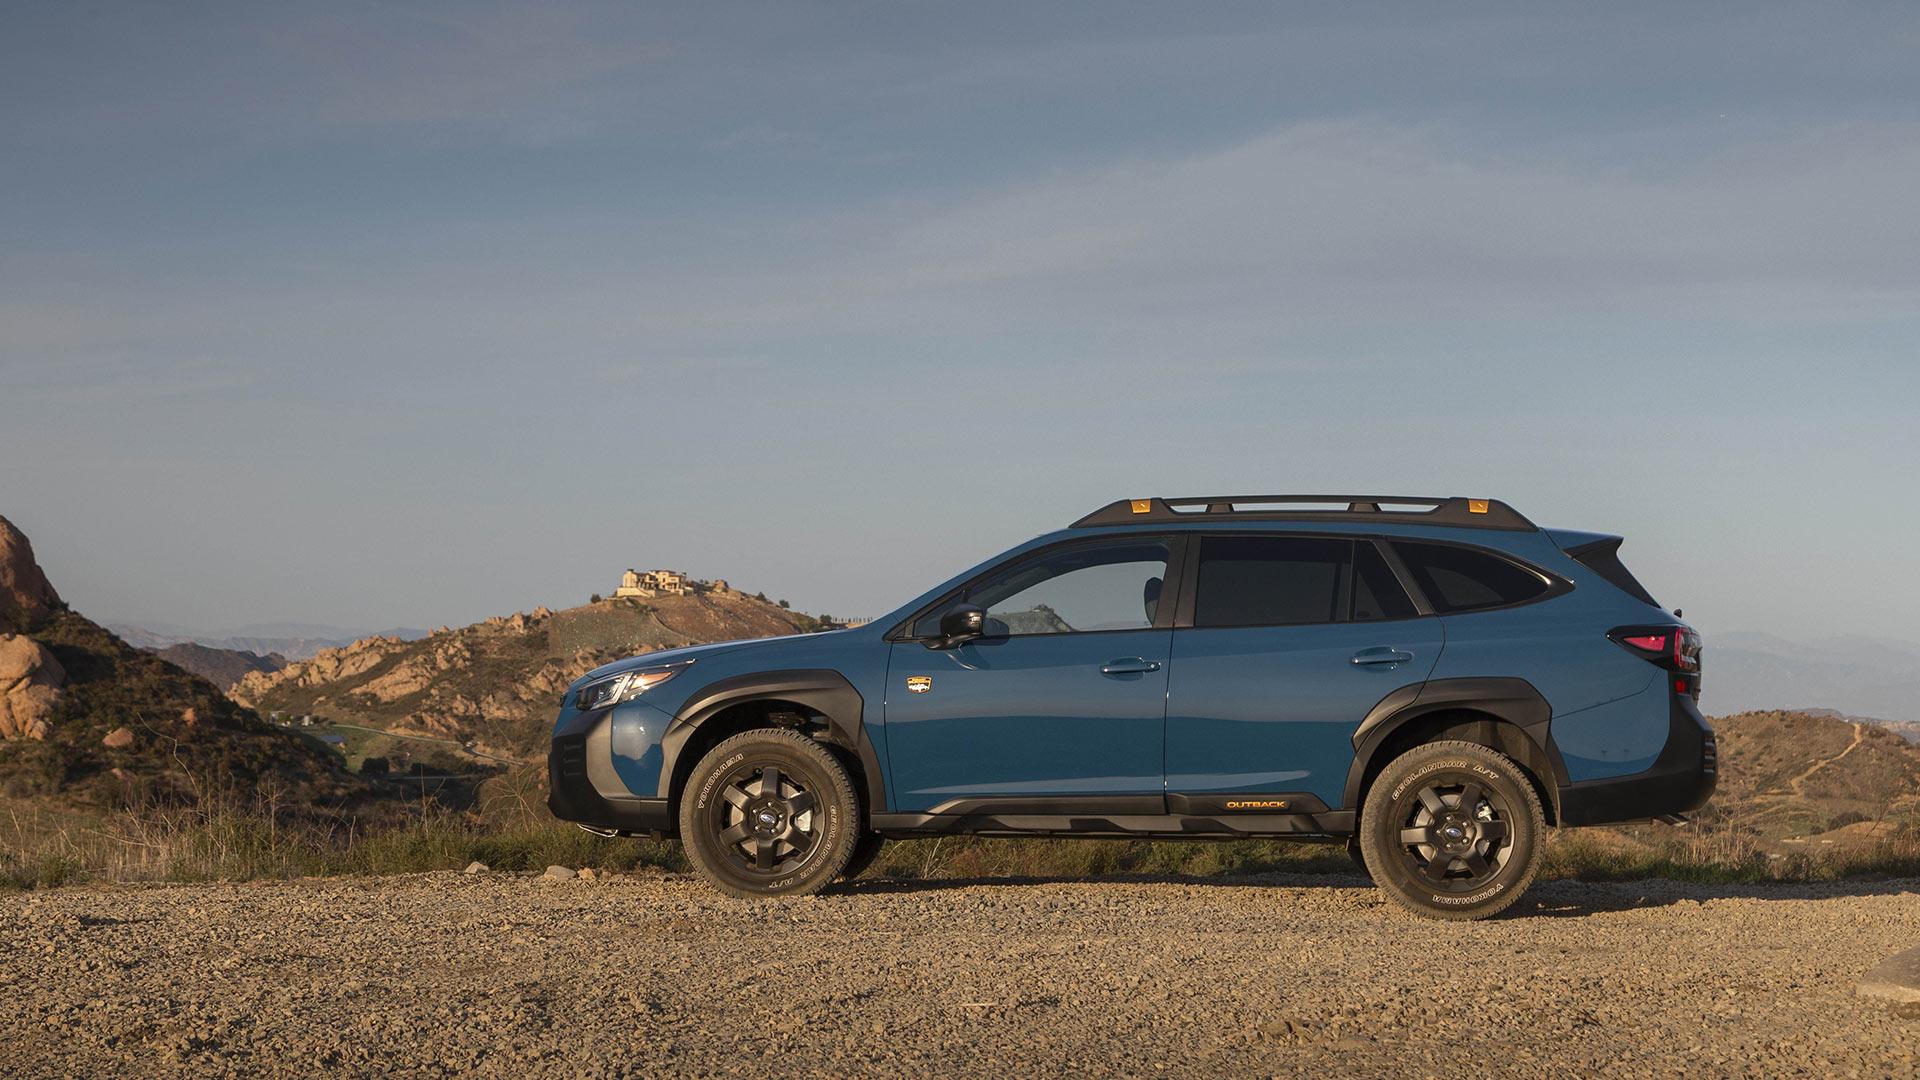 The Subaru Outback Wilderness Profile